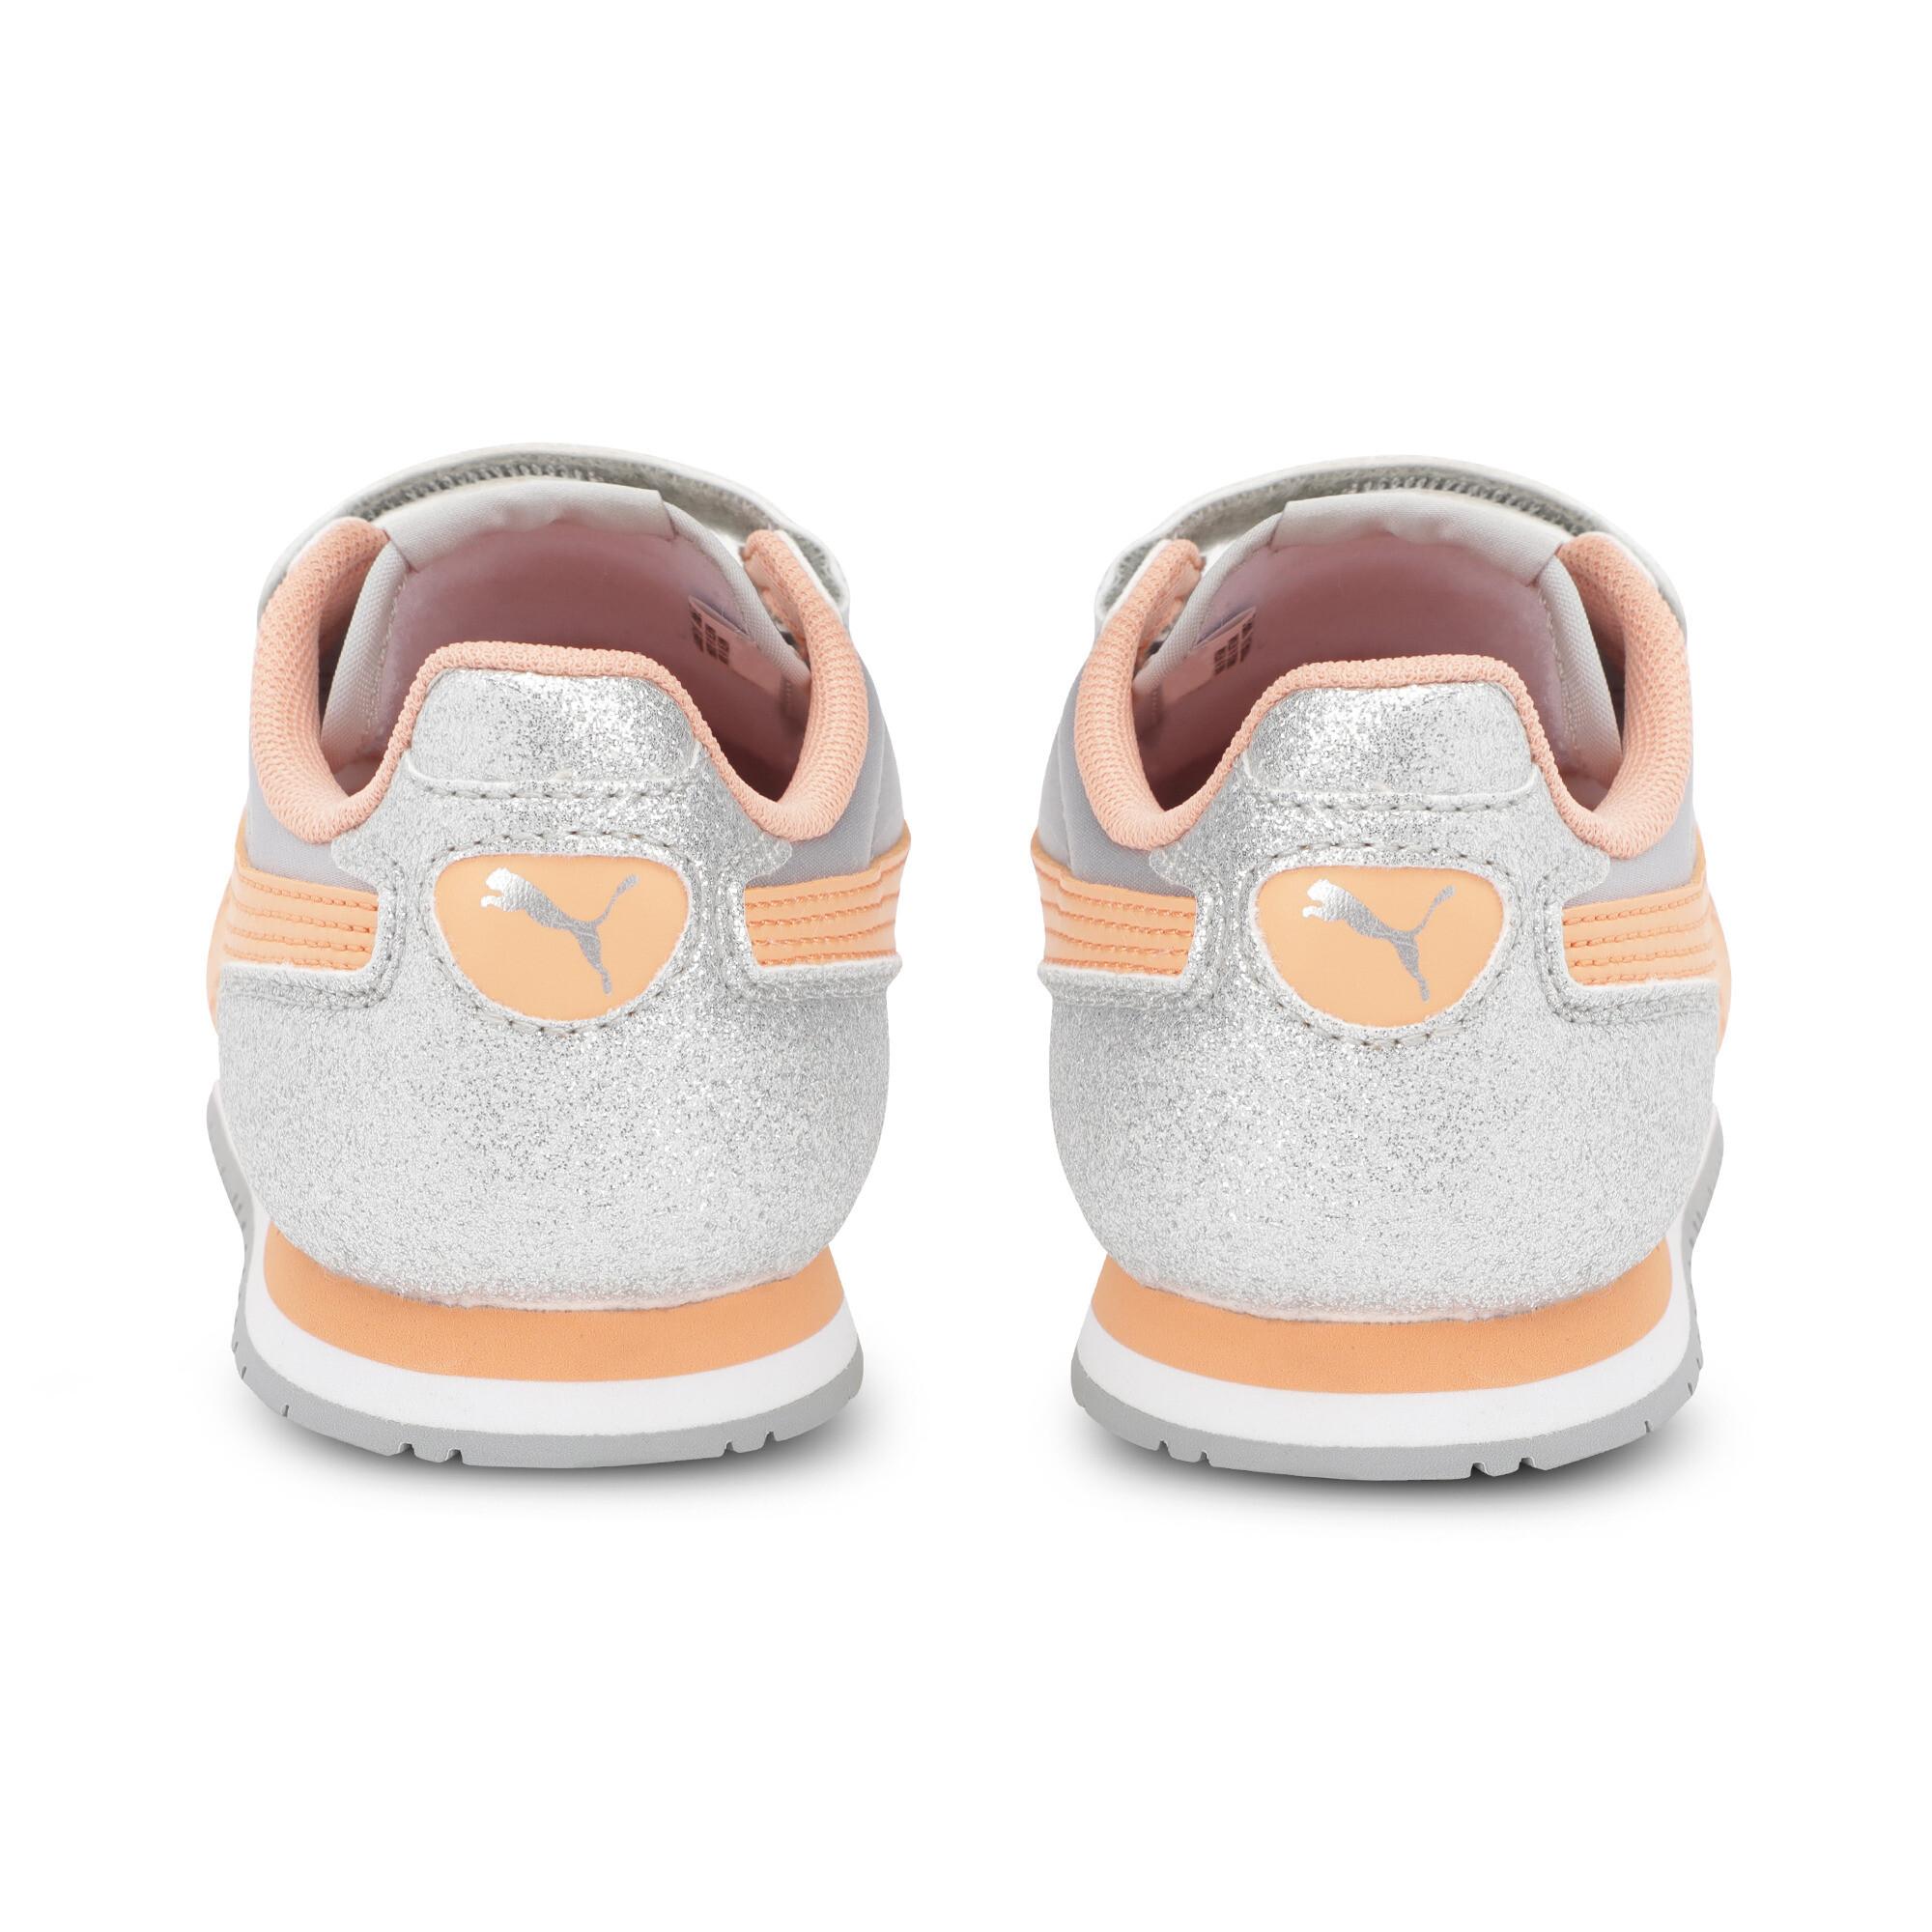 PUMA-Pre-School-Girl-039-s-Cabana-Racer-Glitz-AC-Shoes thumbnail 21